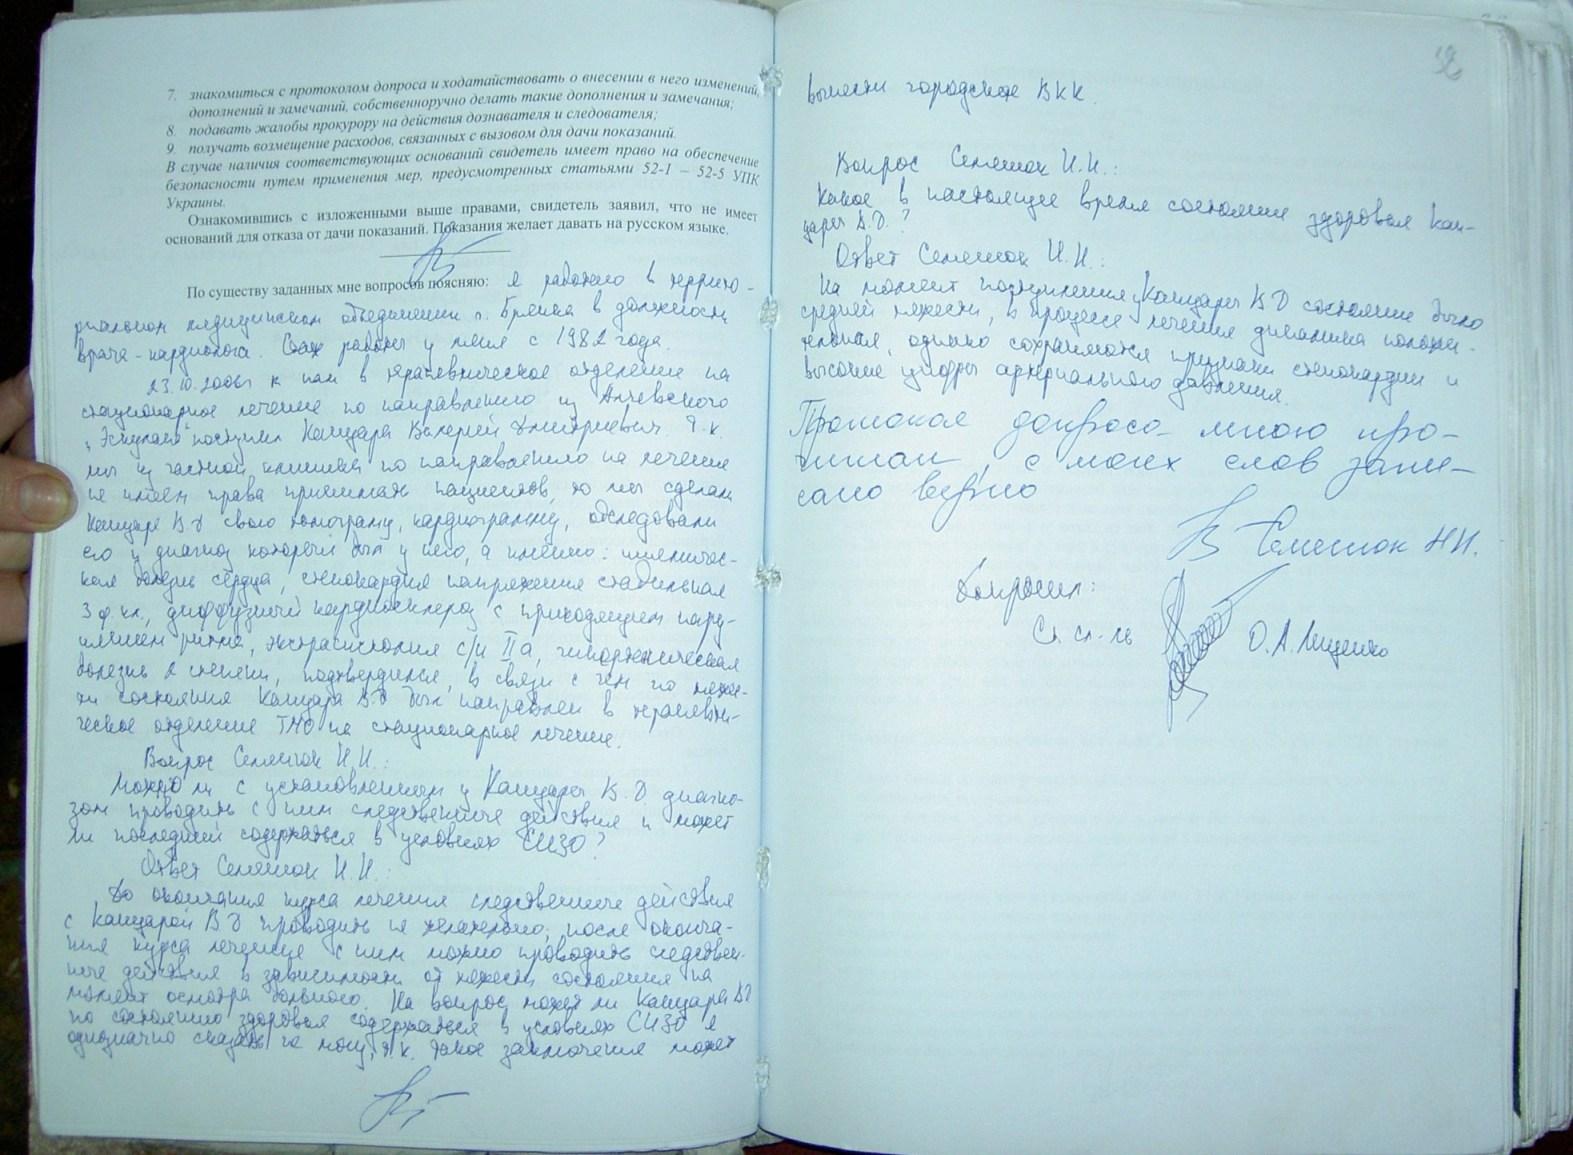 образец протокола допроса